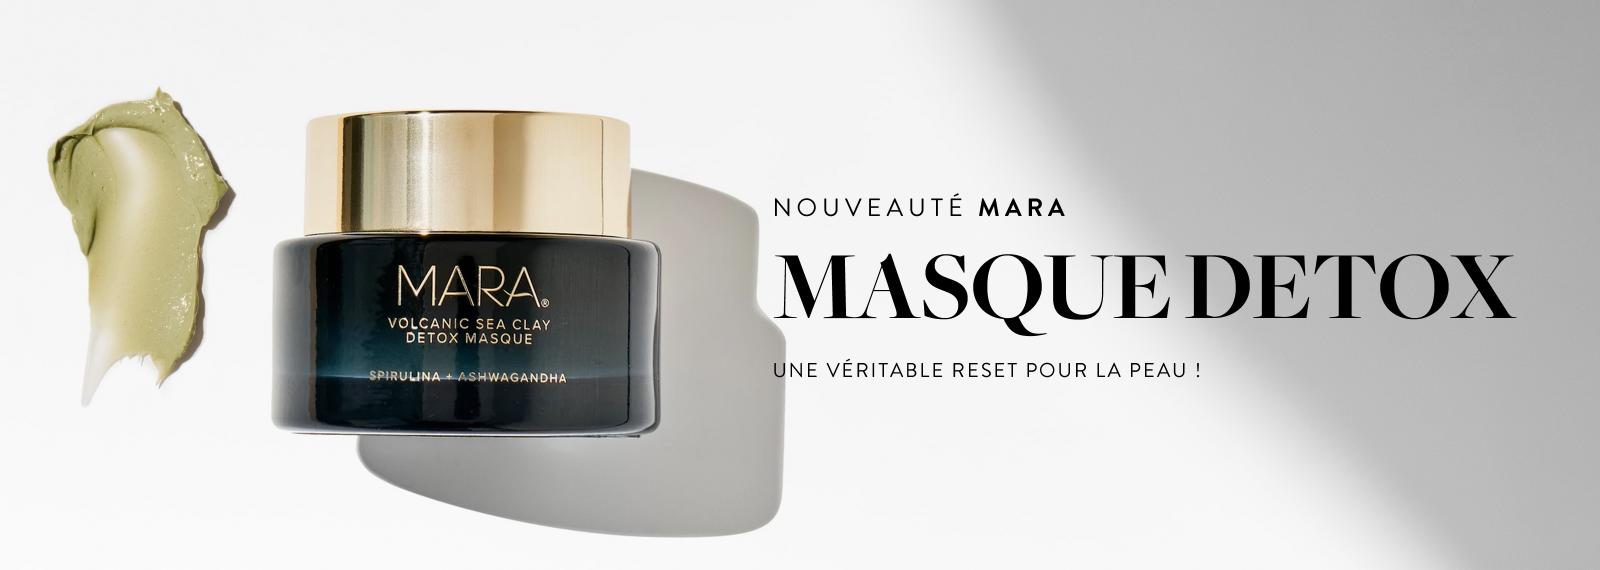 Nouveauté - MARA - Masque Detox